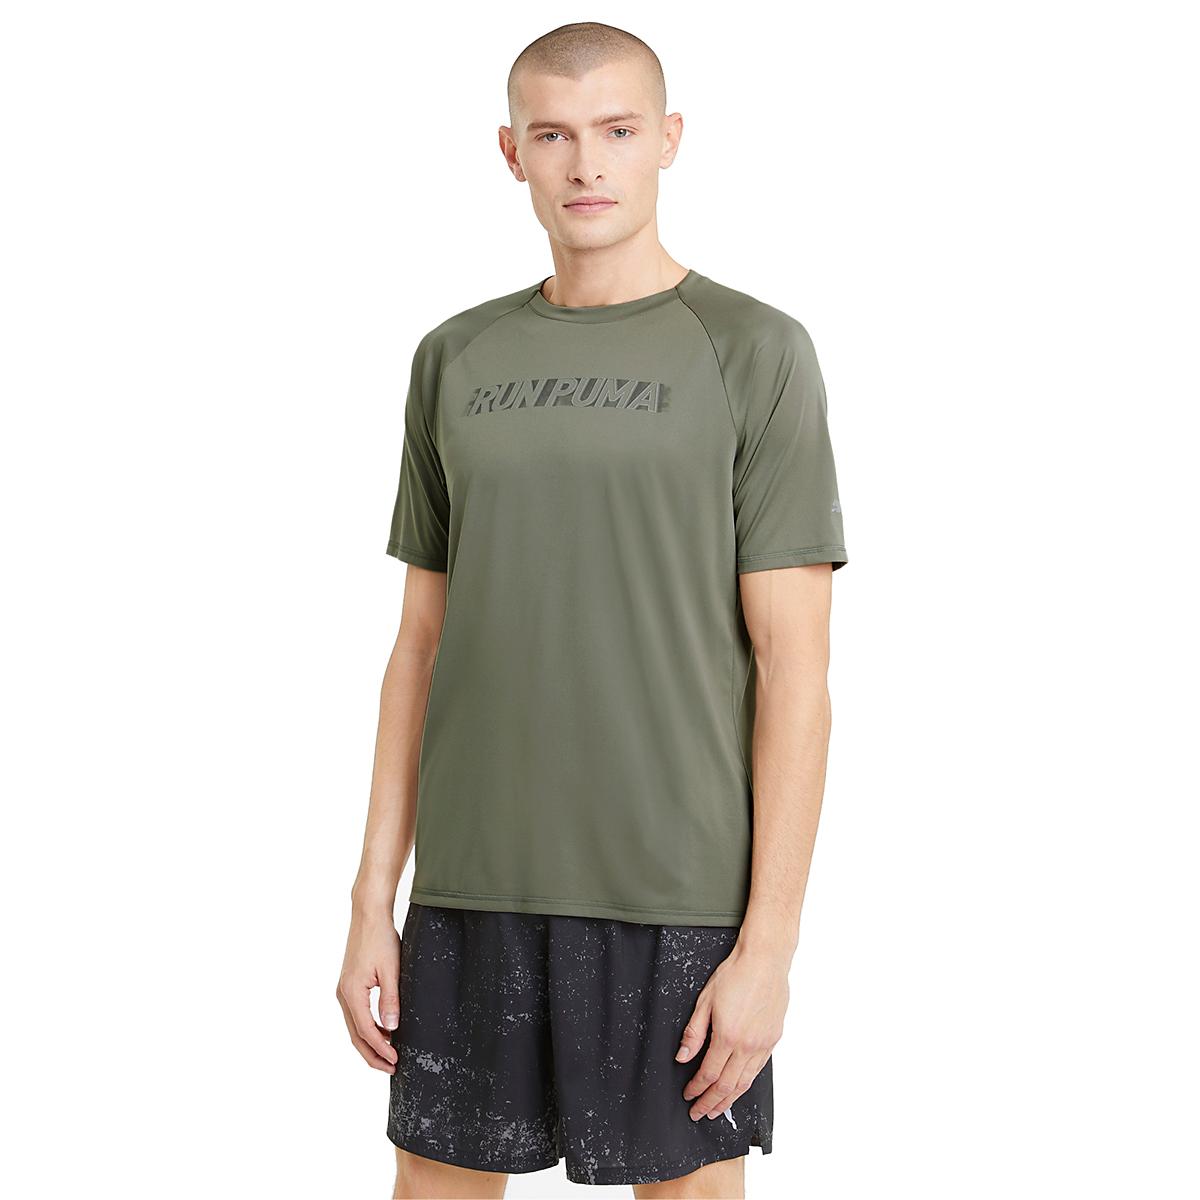 Men's Puma Run Lite COOLadapt Short Sleeve Tee - Color: Vetiver - Size: XXS, Vetiver, large, image 1